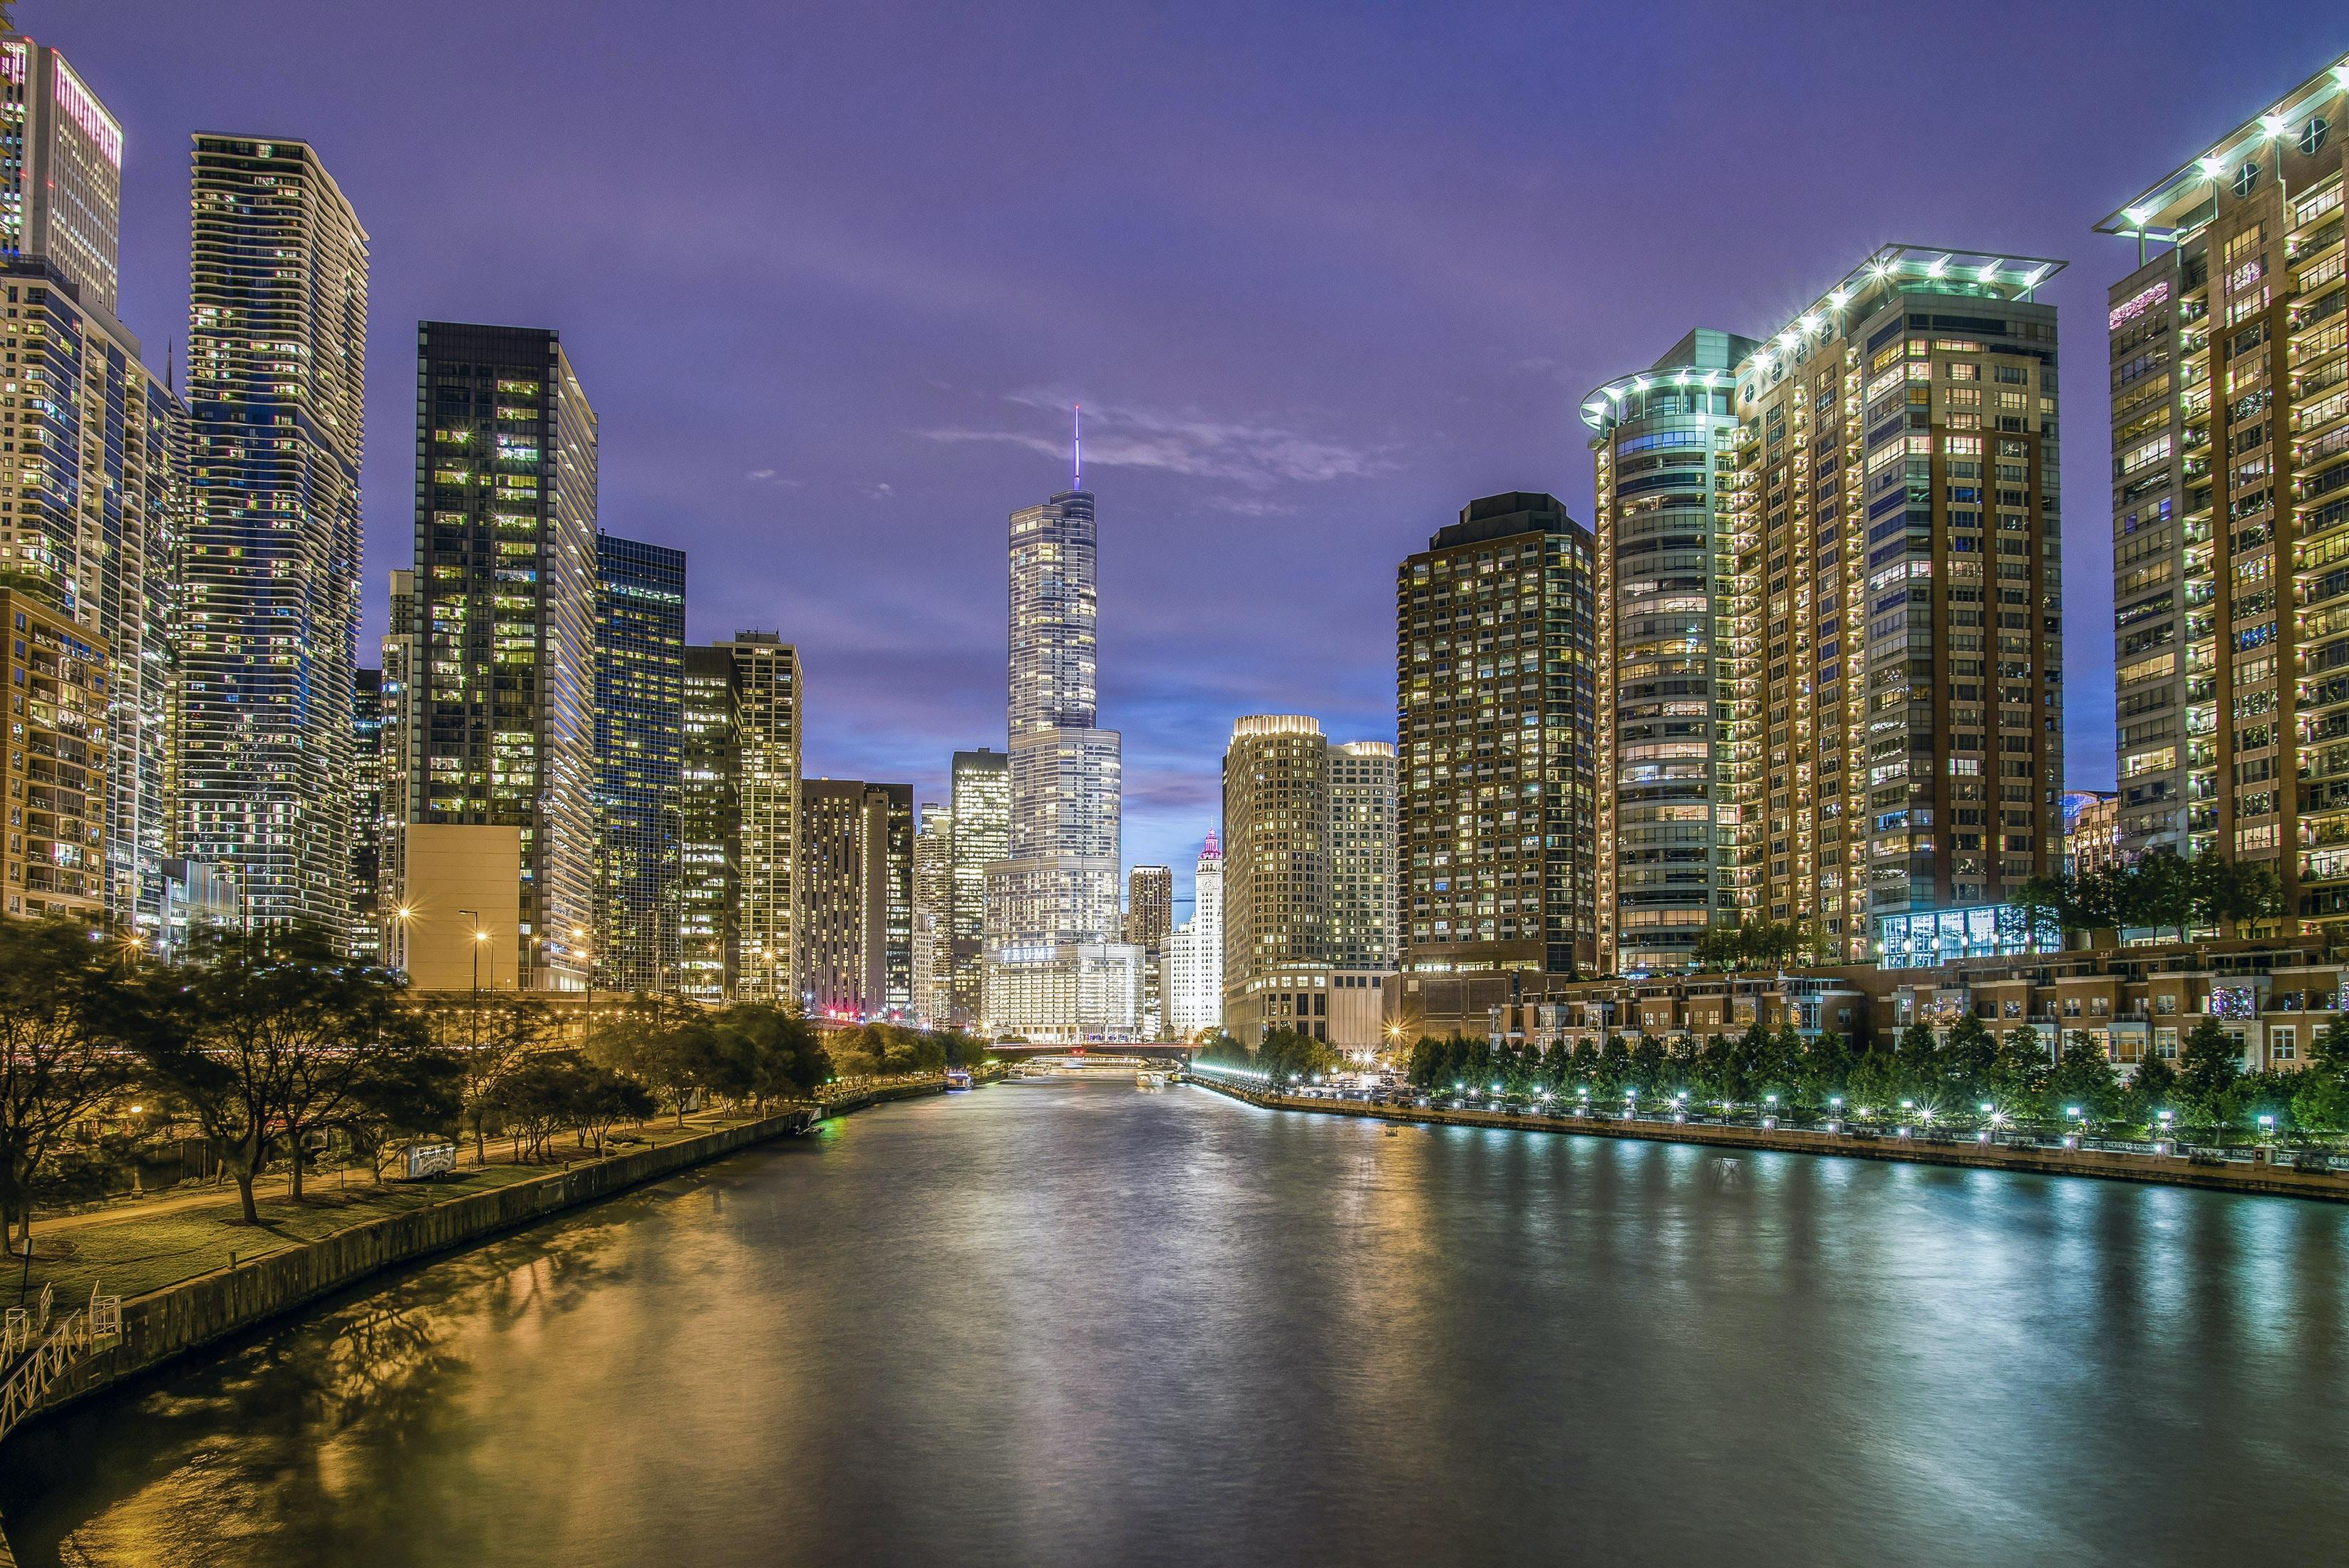 photo of Chicago